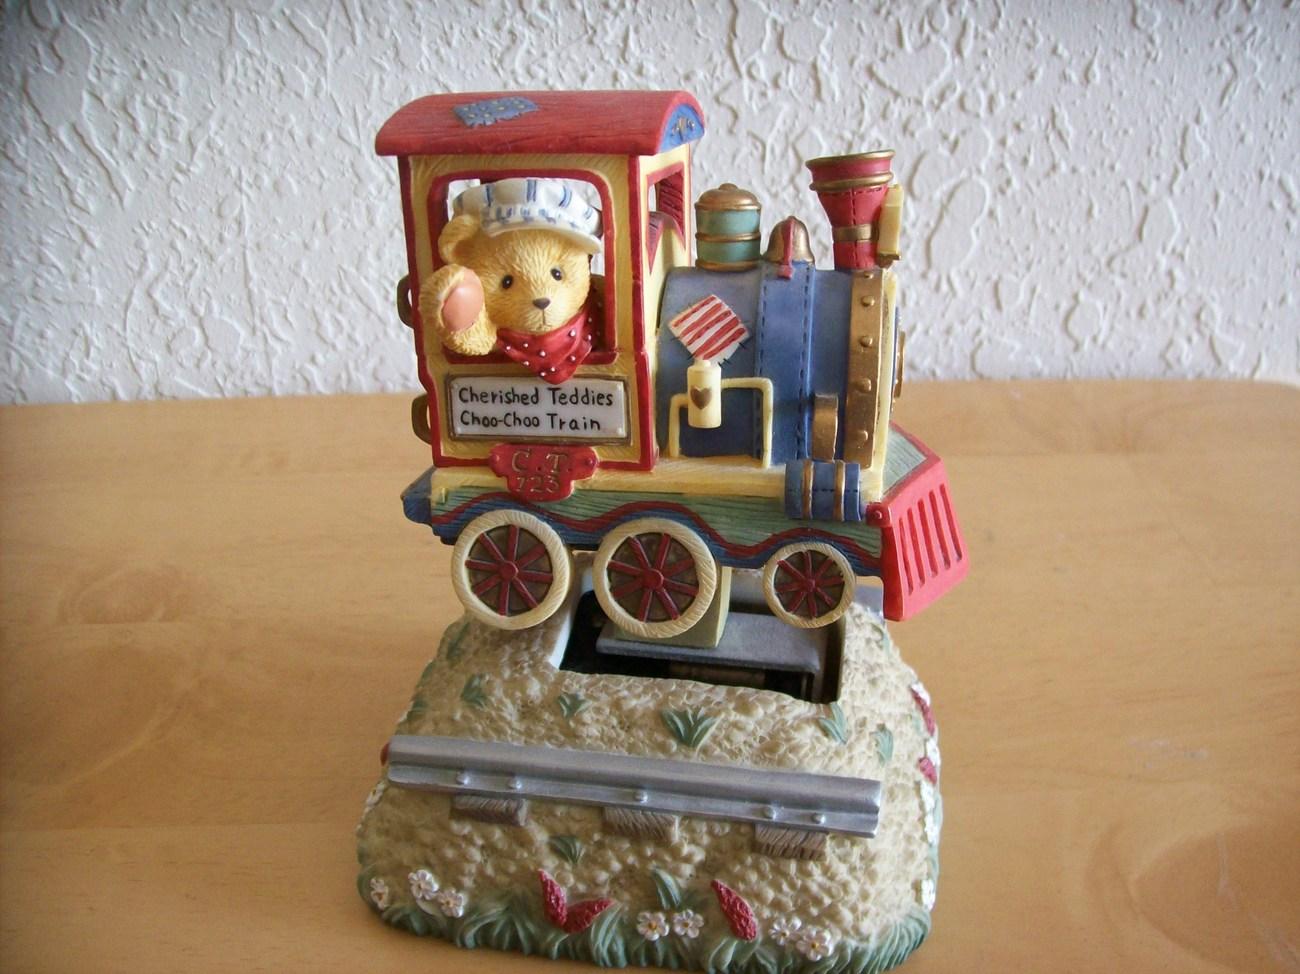 1997 Cherished Teddies Choo-Choo Train Animated Musical Figurine